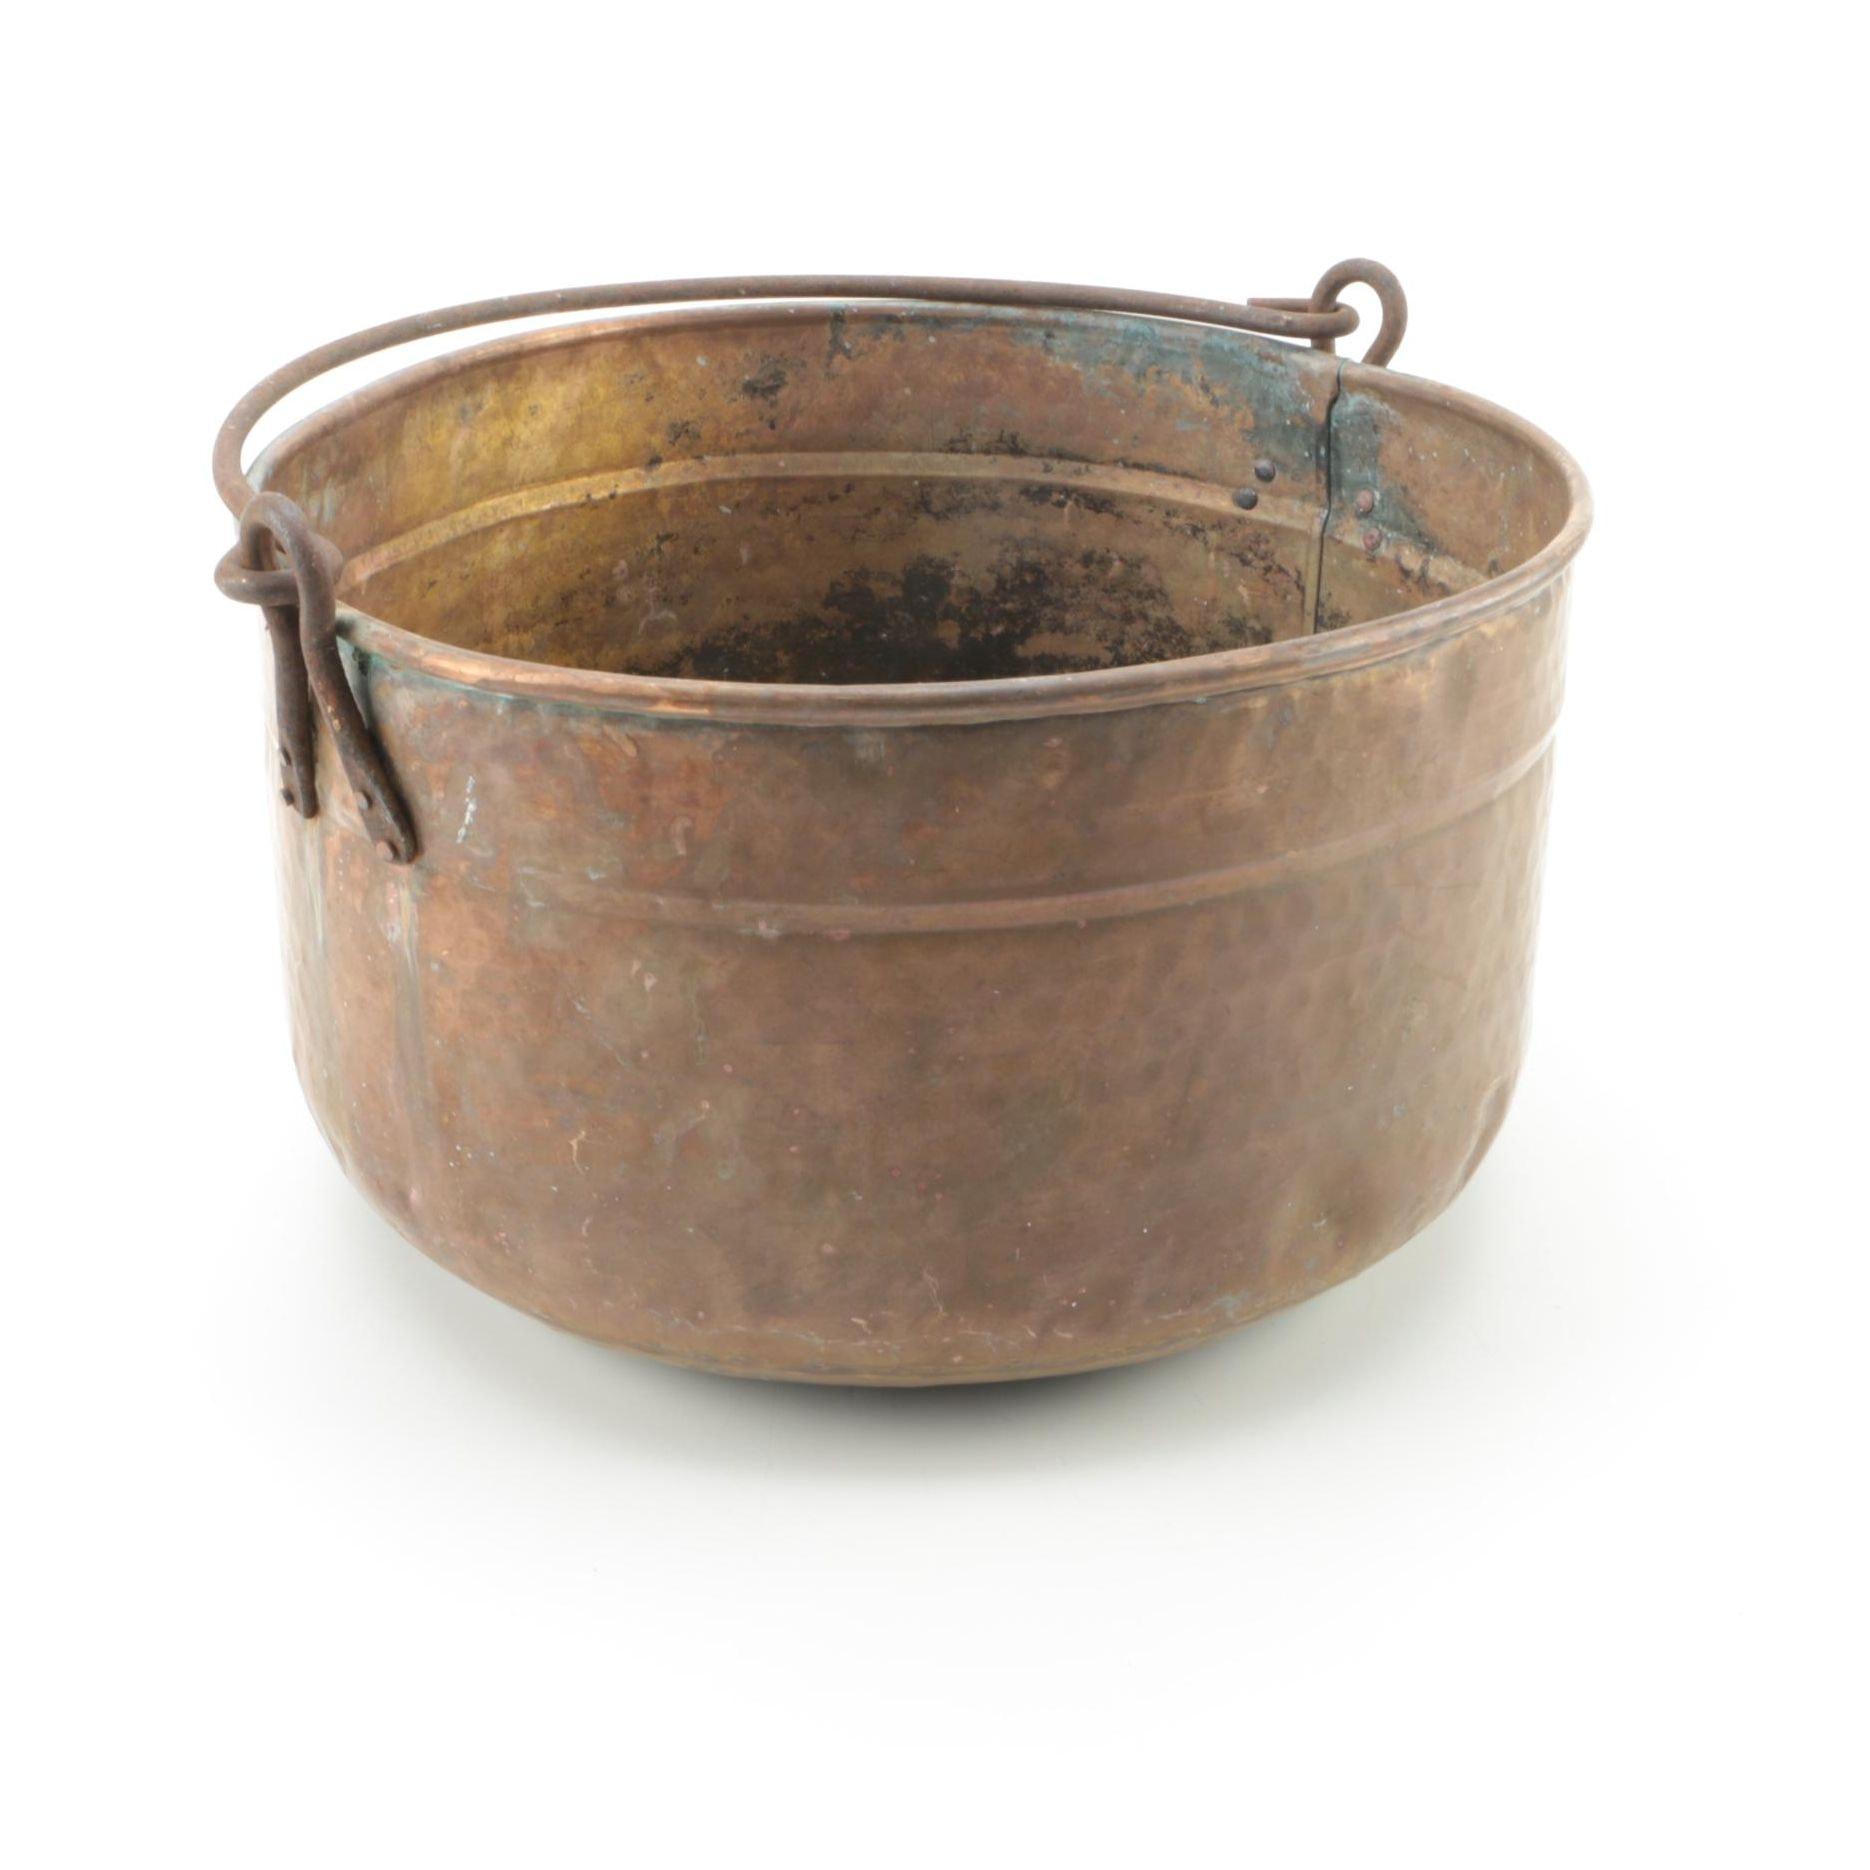 Large Hammered Copper Cauldron